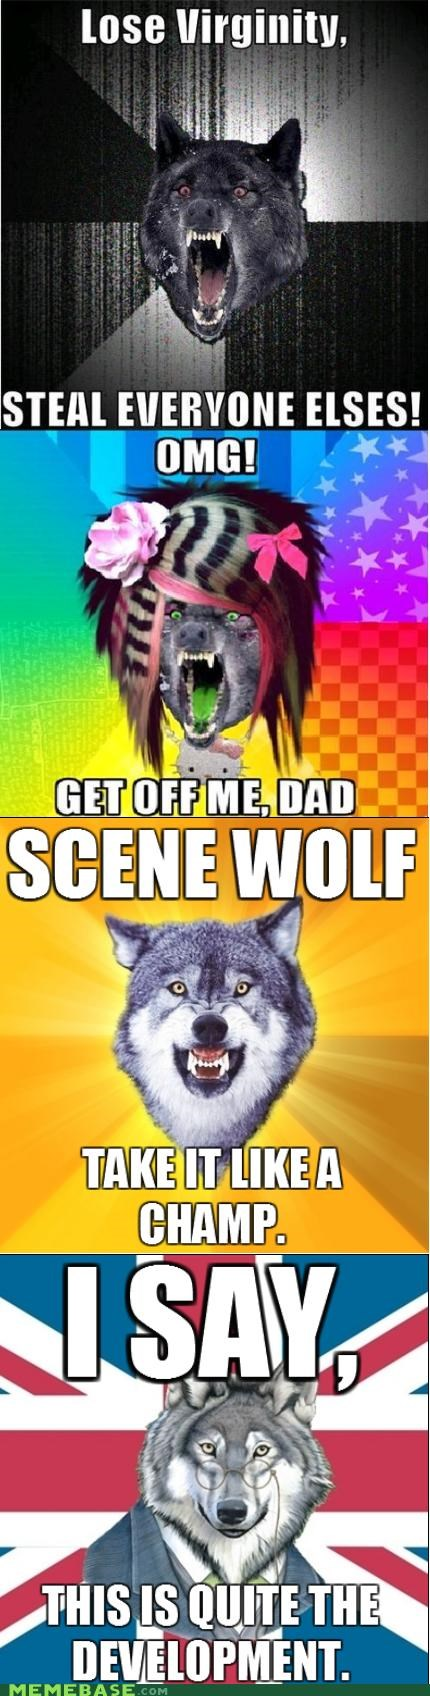 Courage Wolf Insanity Wolf reunion saga scene wolf wolves - 4767640320